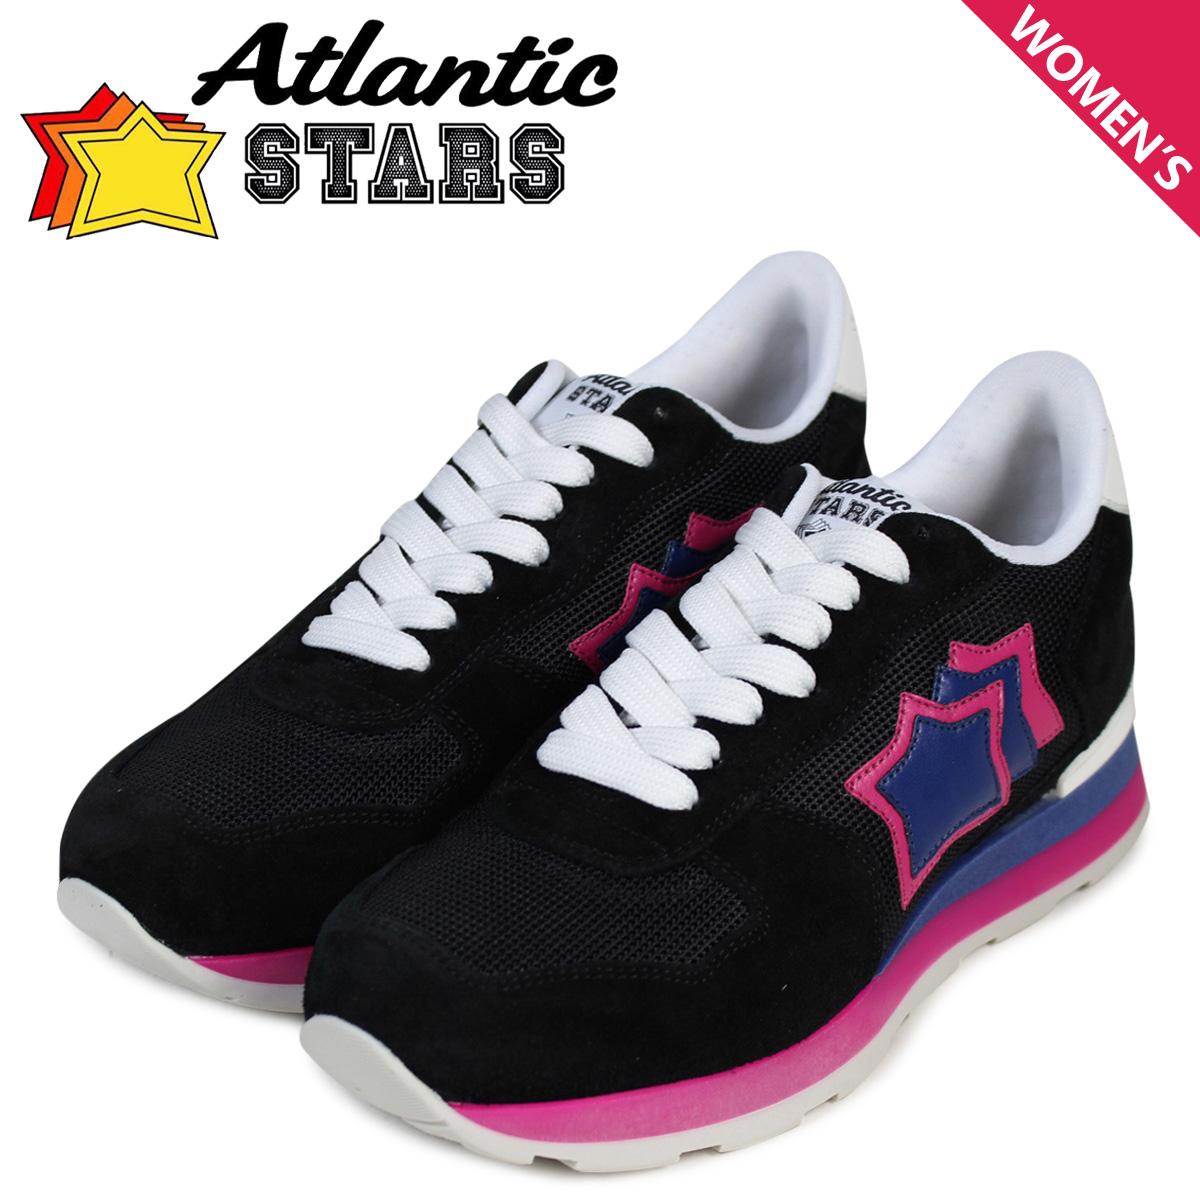 Atlantic STARS レディース スニーカー アトランティックスターズ ベガ VEGA NNF-62B 靴 ブラック 黒